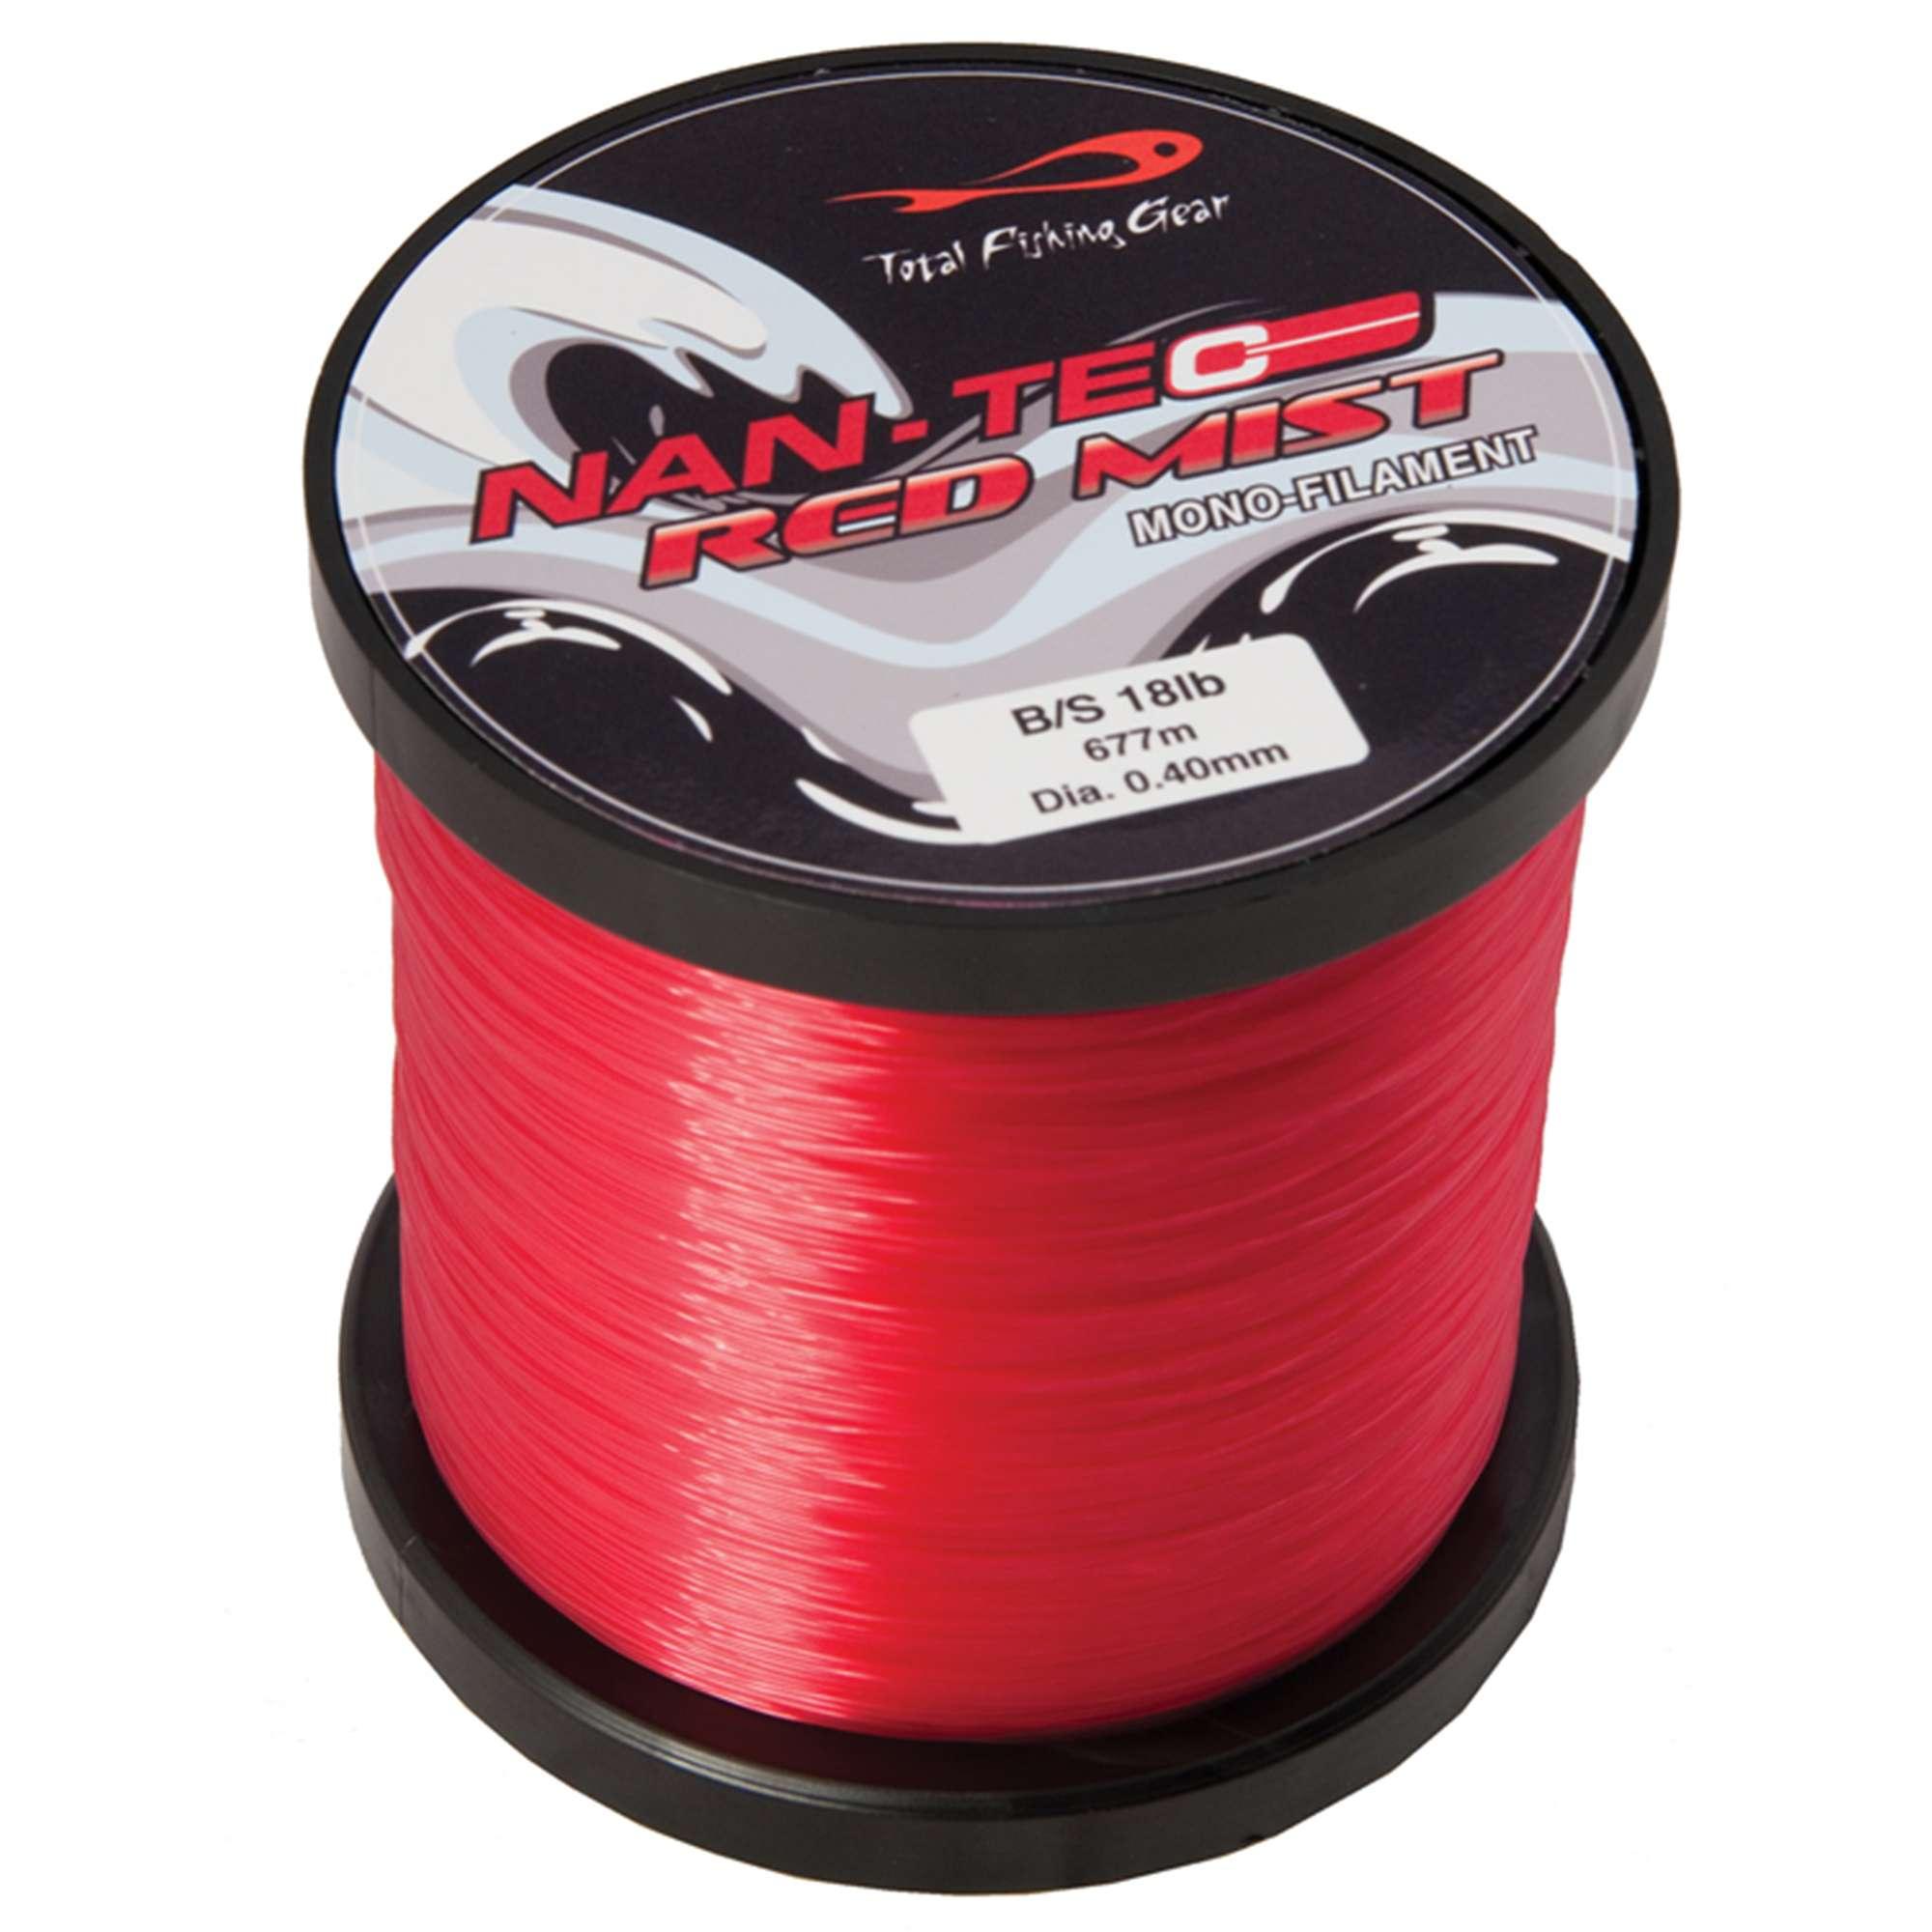 TFG Nan-Tec Red Mist Mono Filament Line 18lb